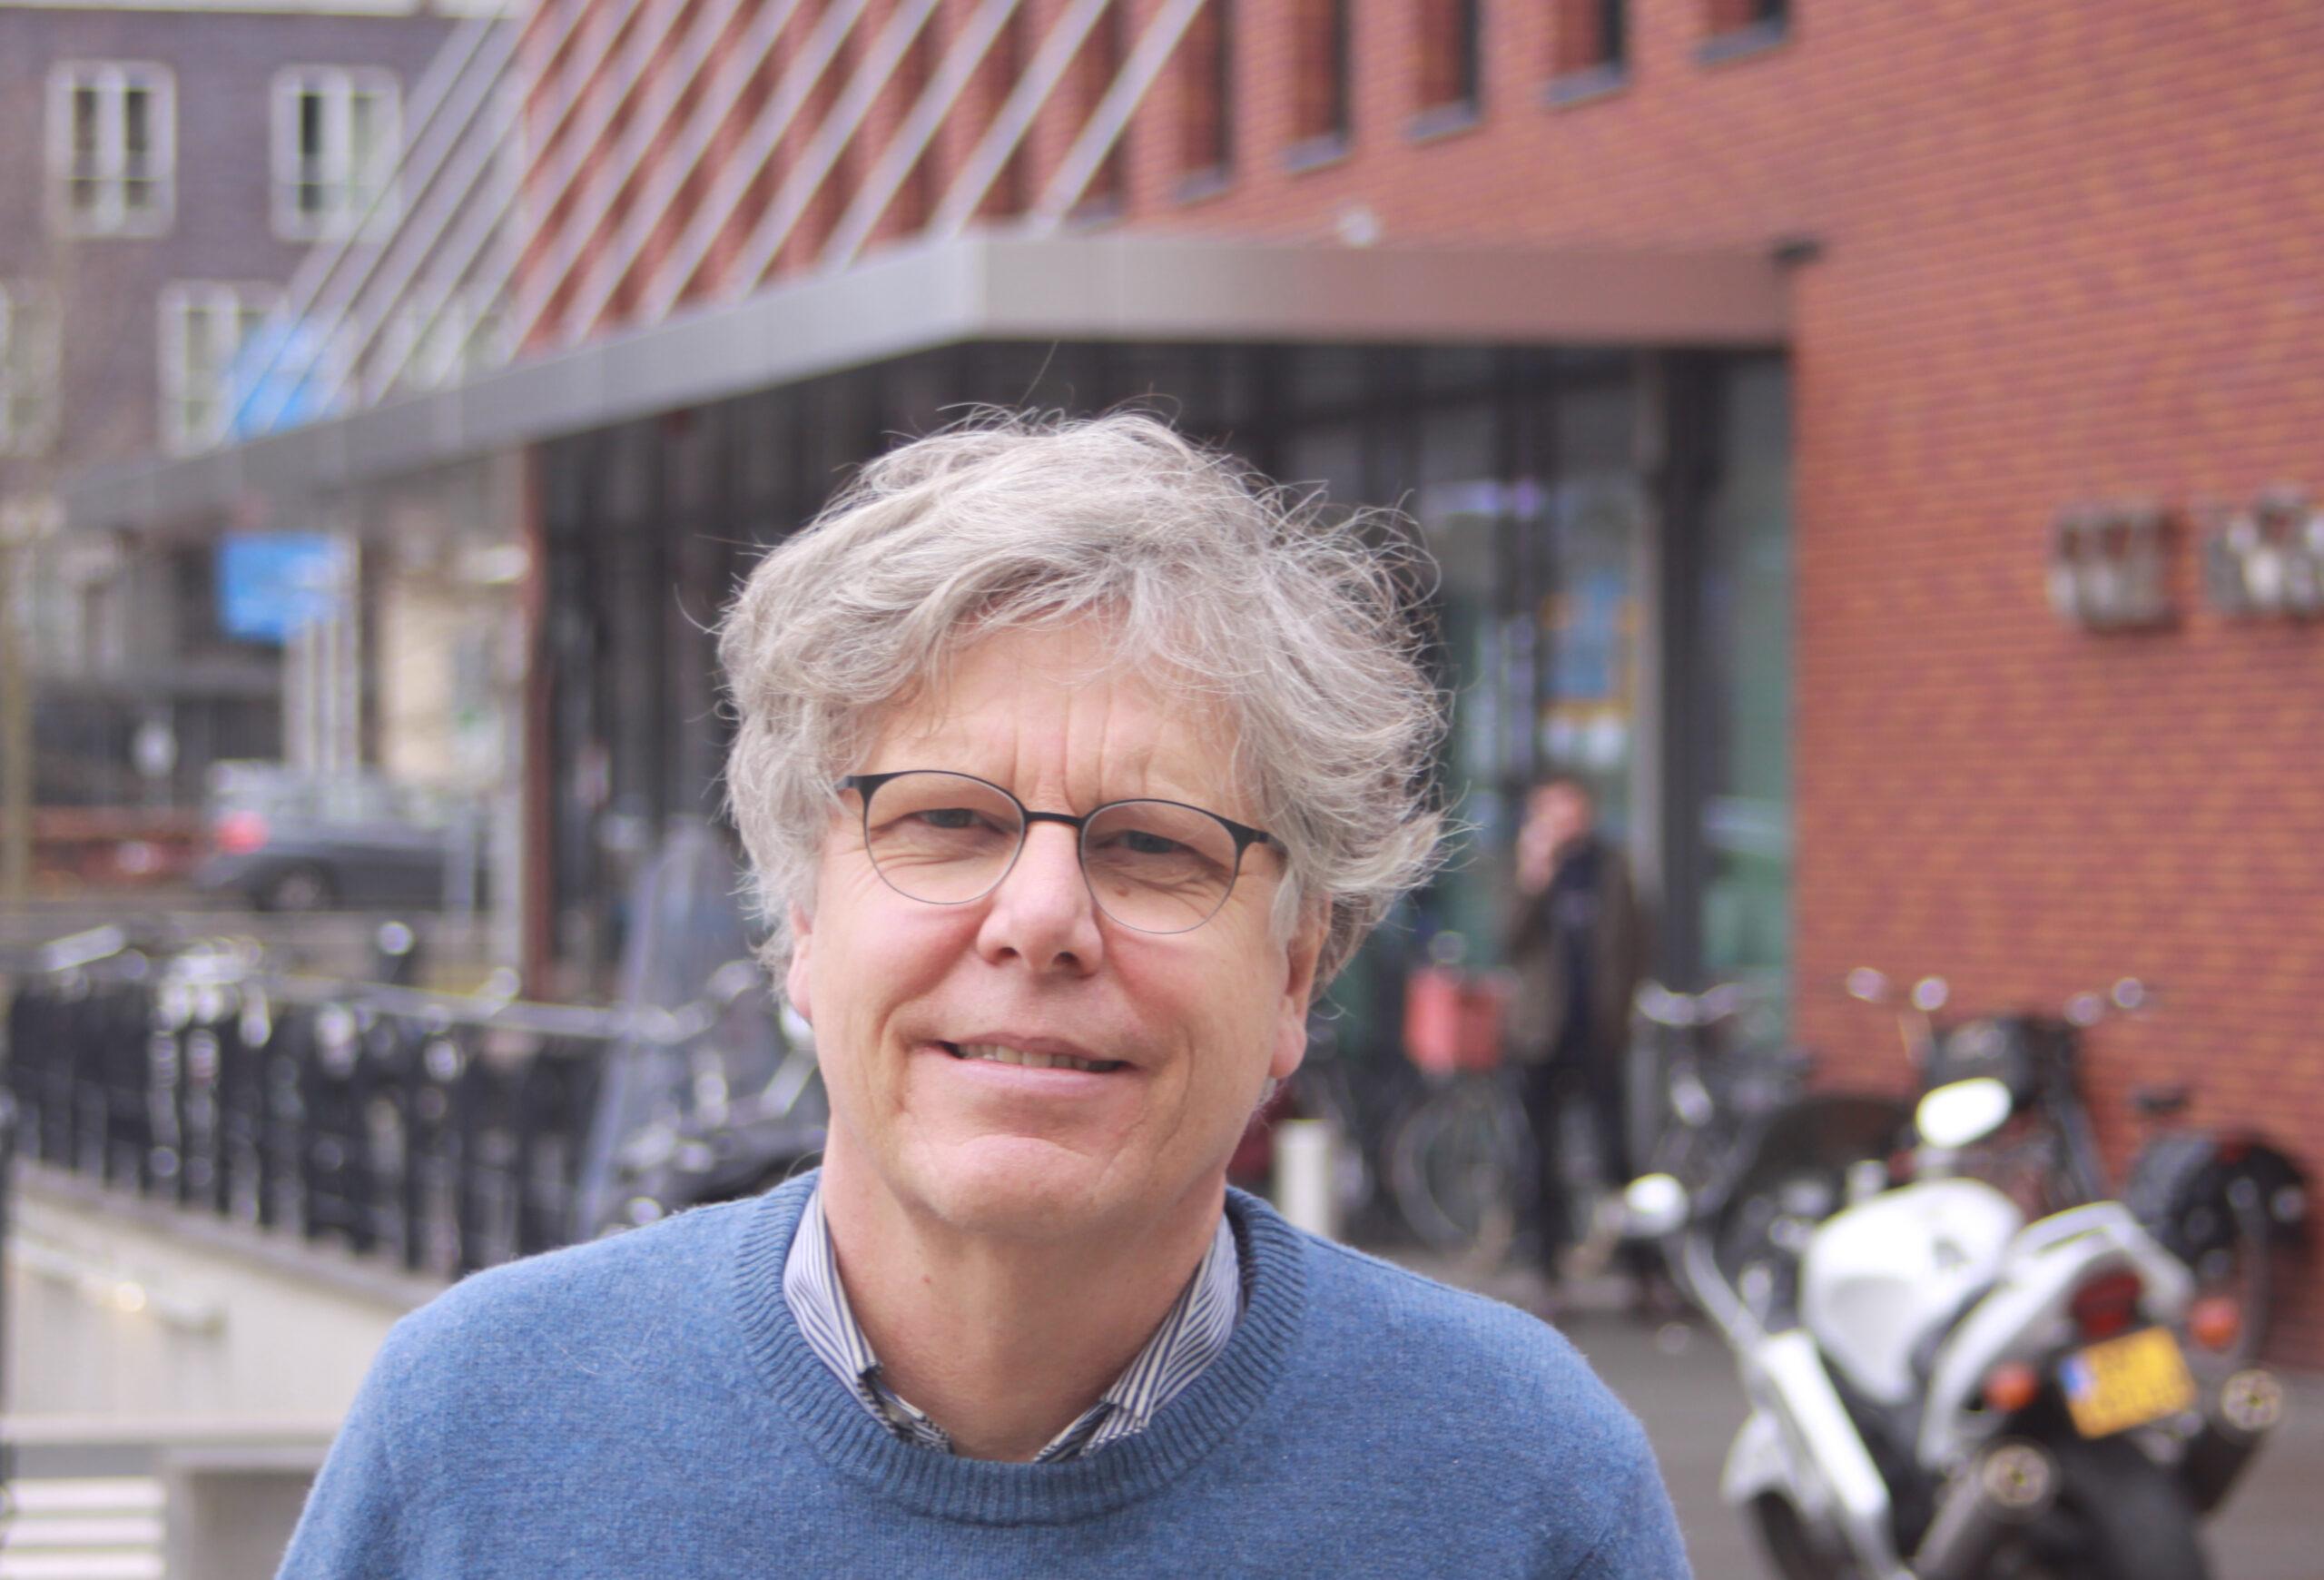 Dr. Sigfried Schouws